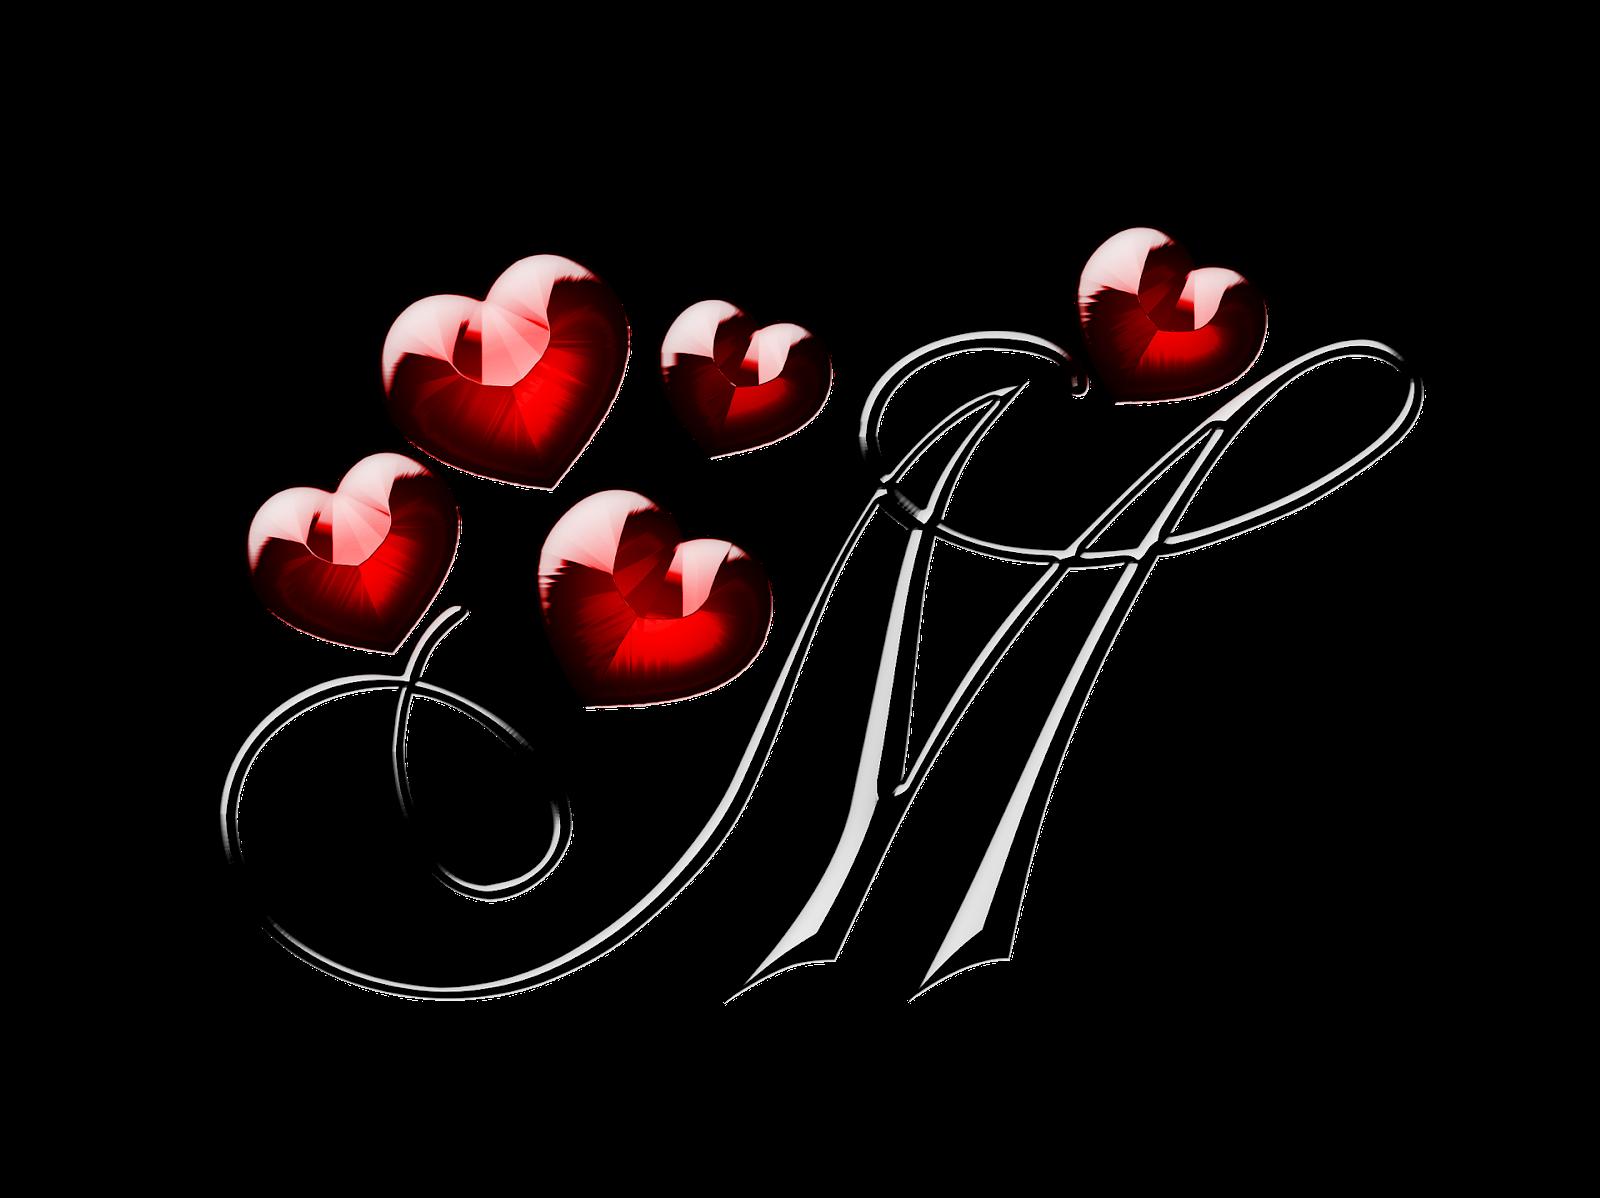 Wallpaper M Love S ✓ Fitrini's Wallpaper